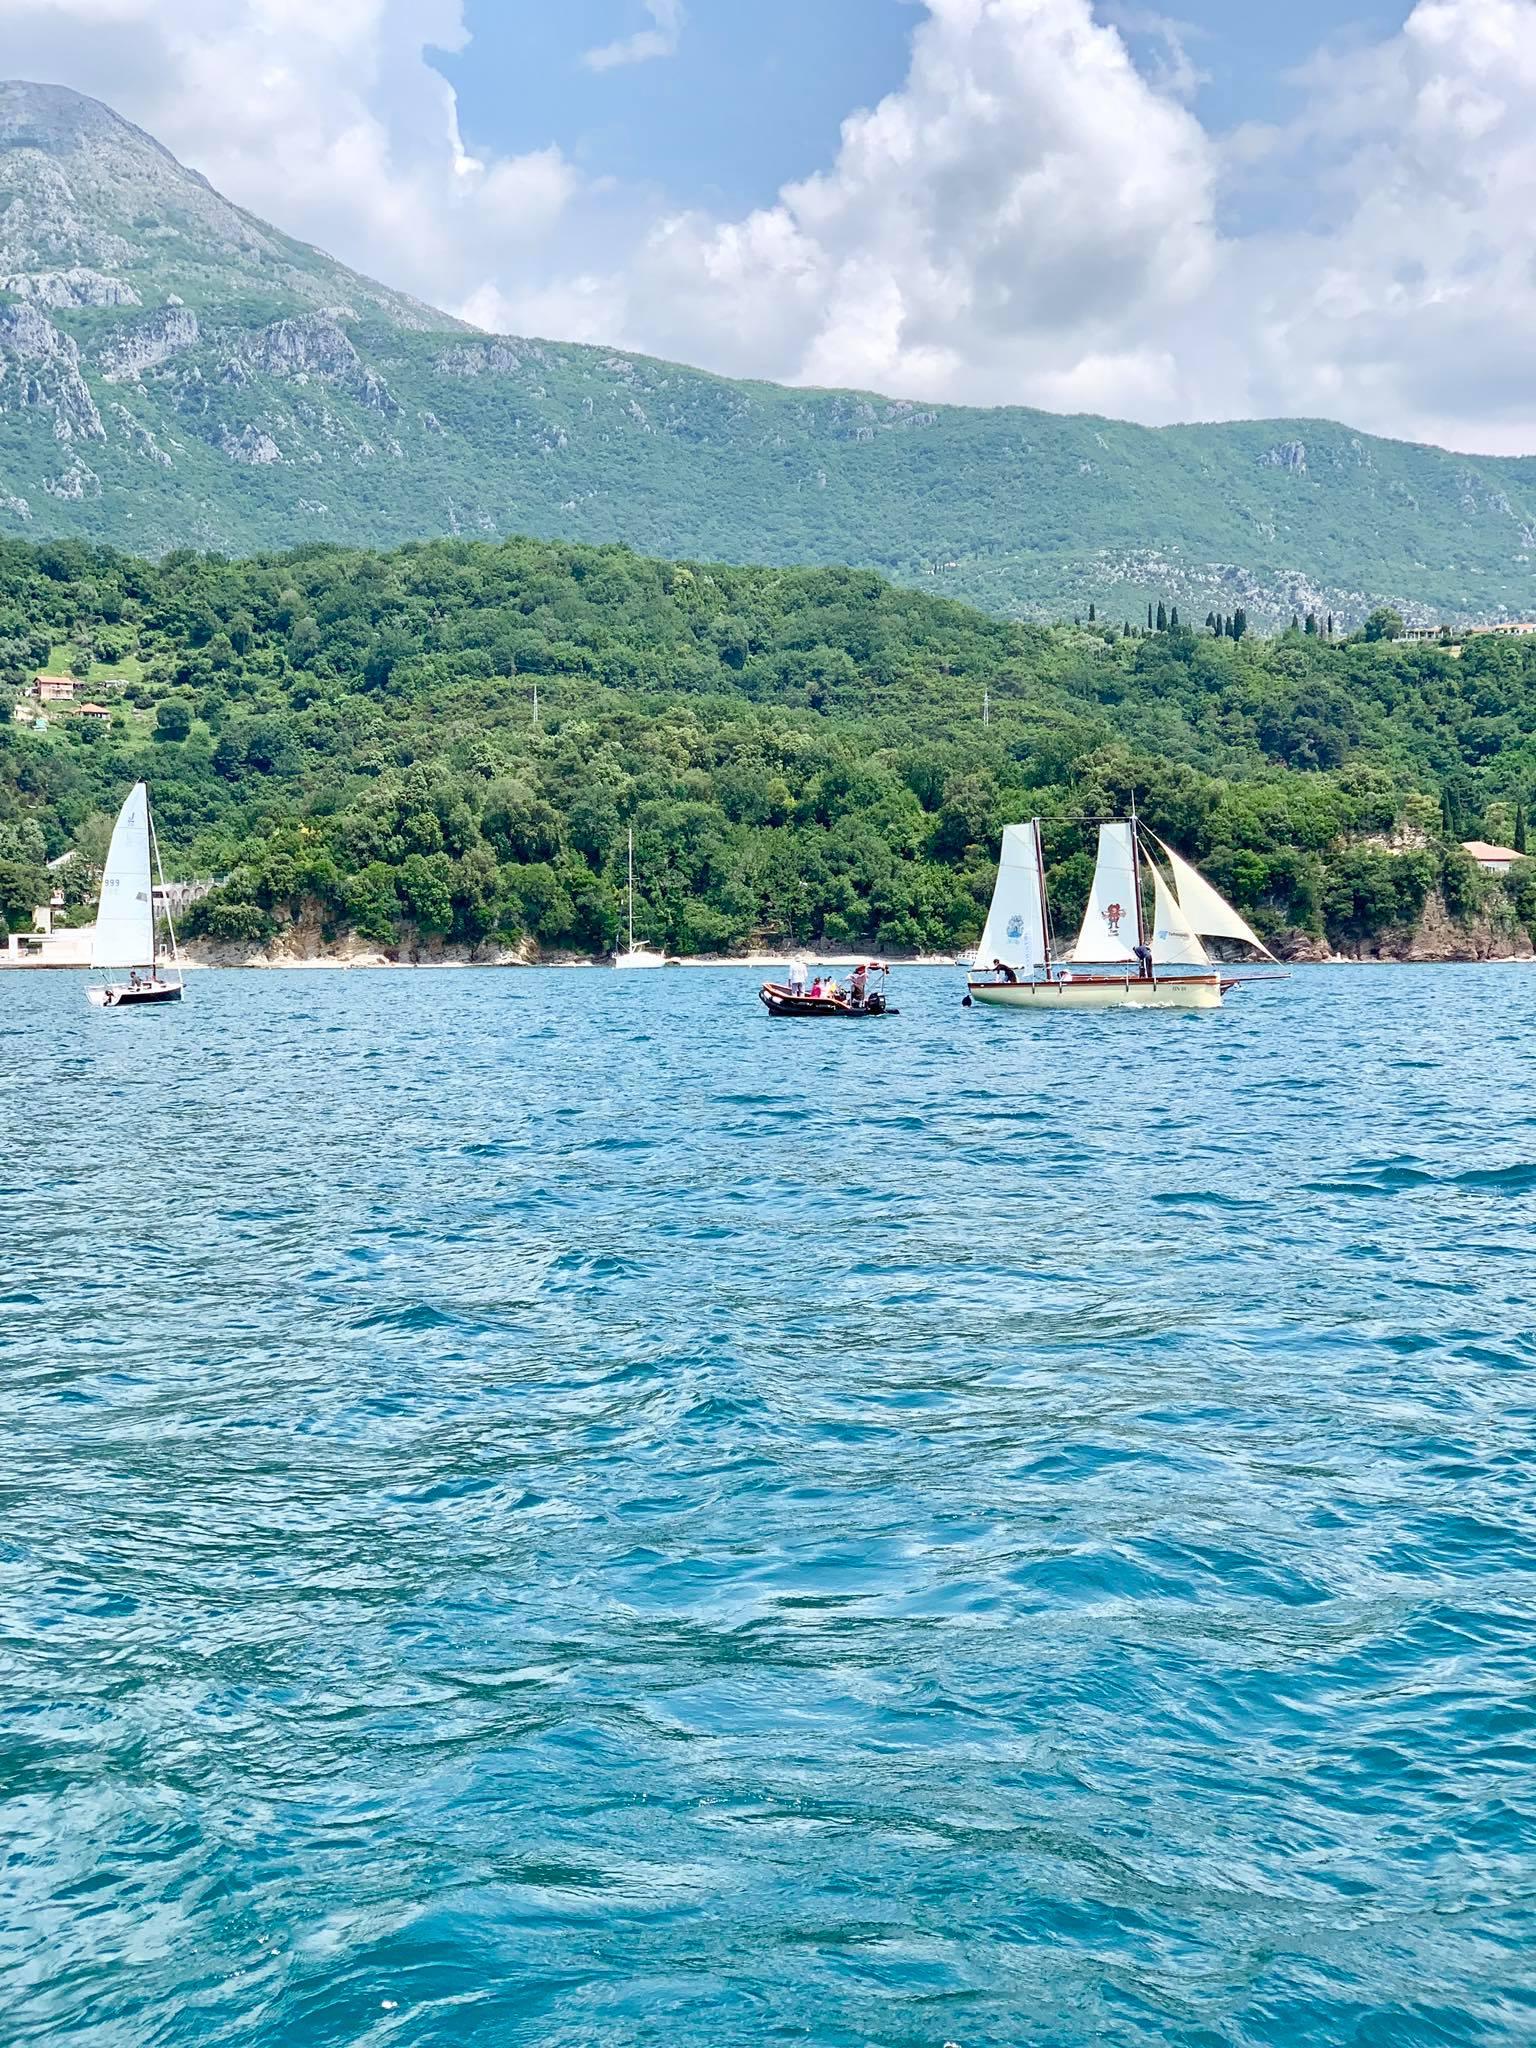 Expat Life in Montenegro Day 2 First full day in Herceg Novi2.jpg